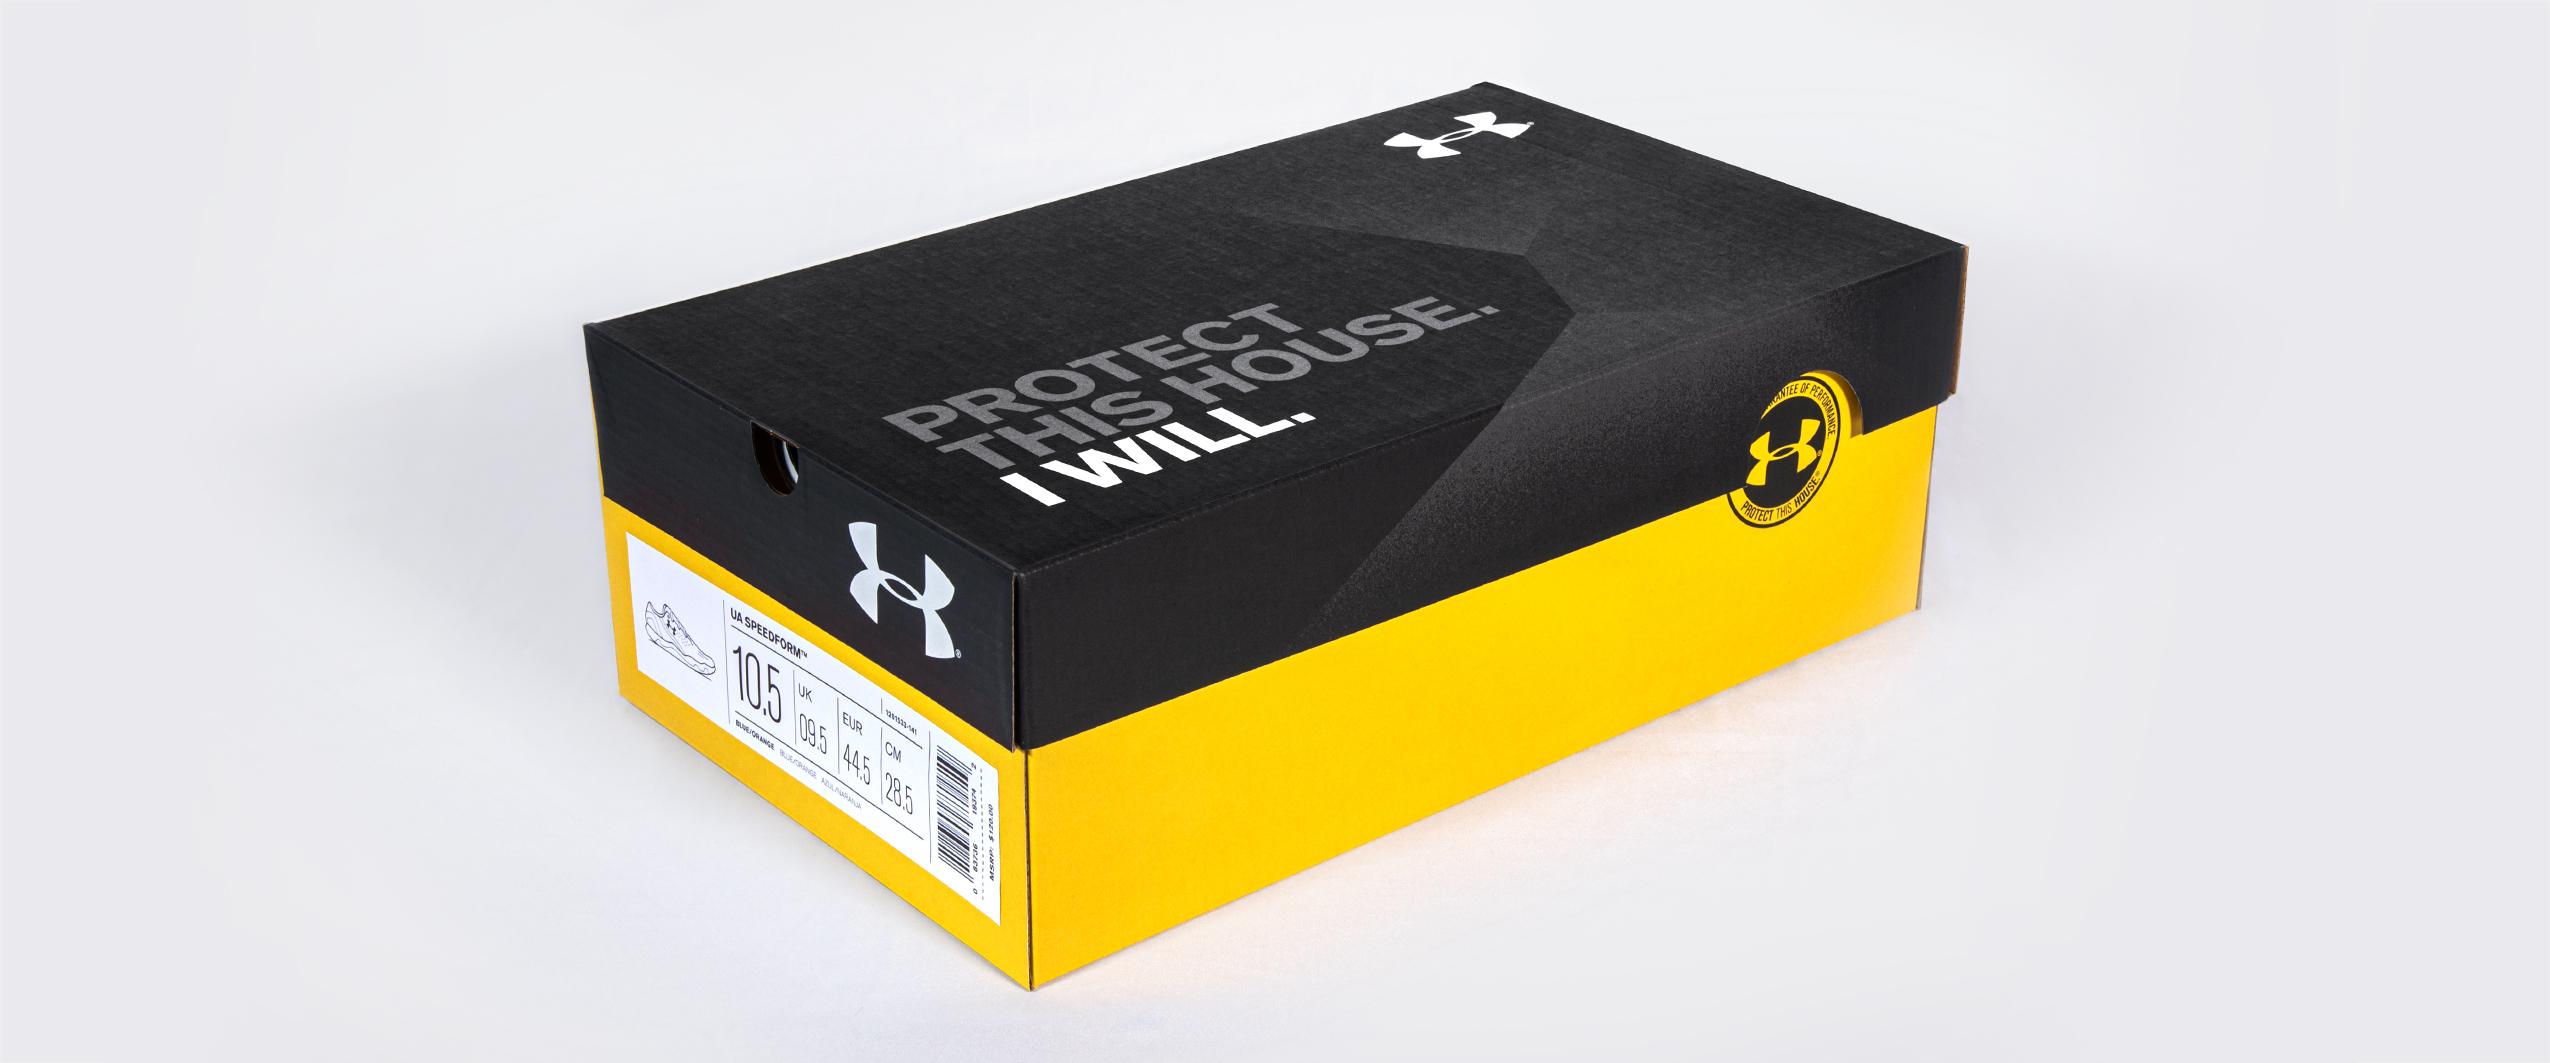 UA_FootwearBox_Small